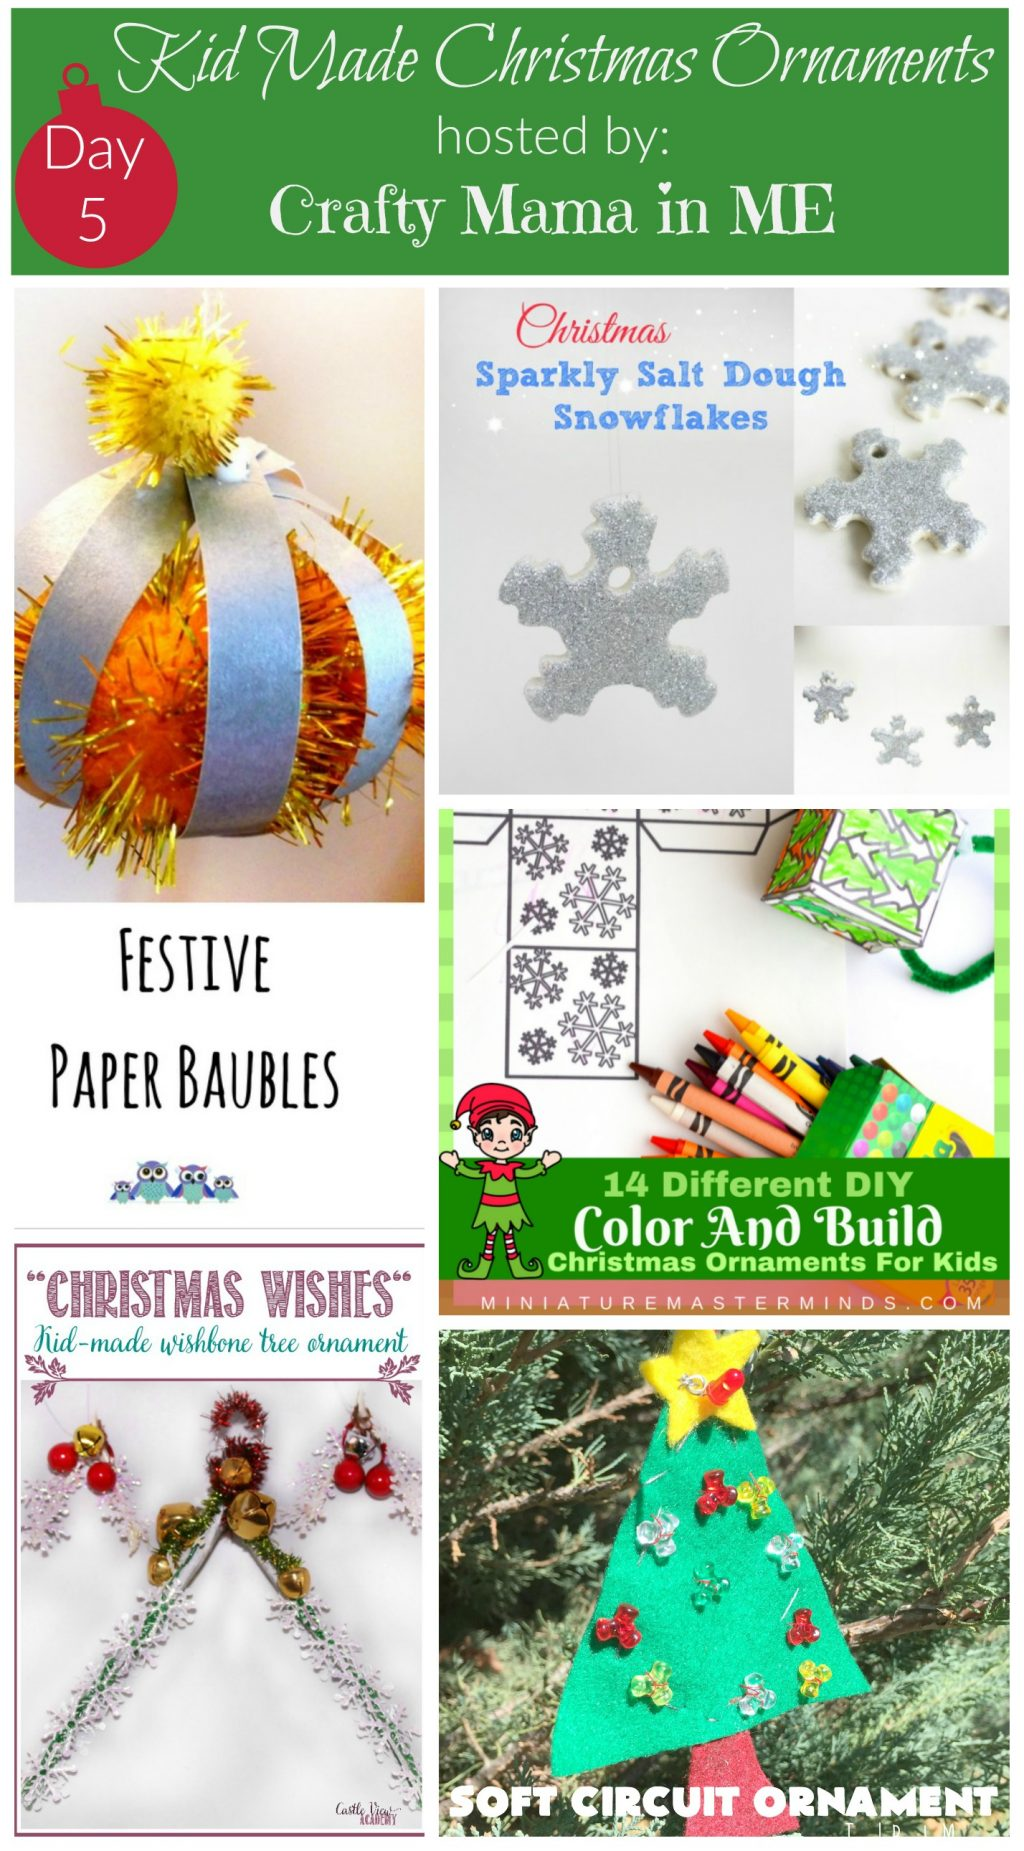 Day 5 - Kid Made Christmas Ornaments Blog Hop